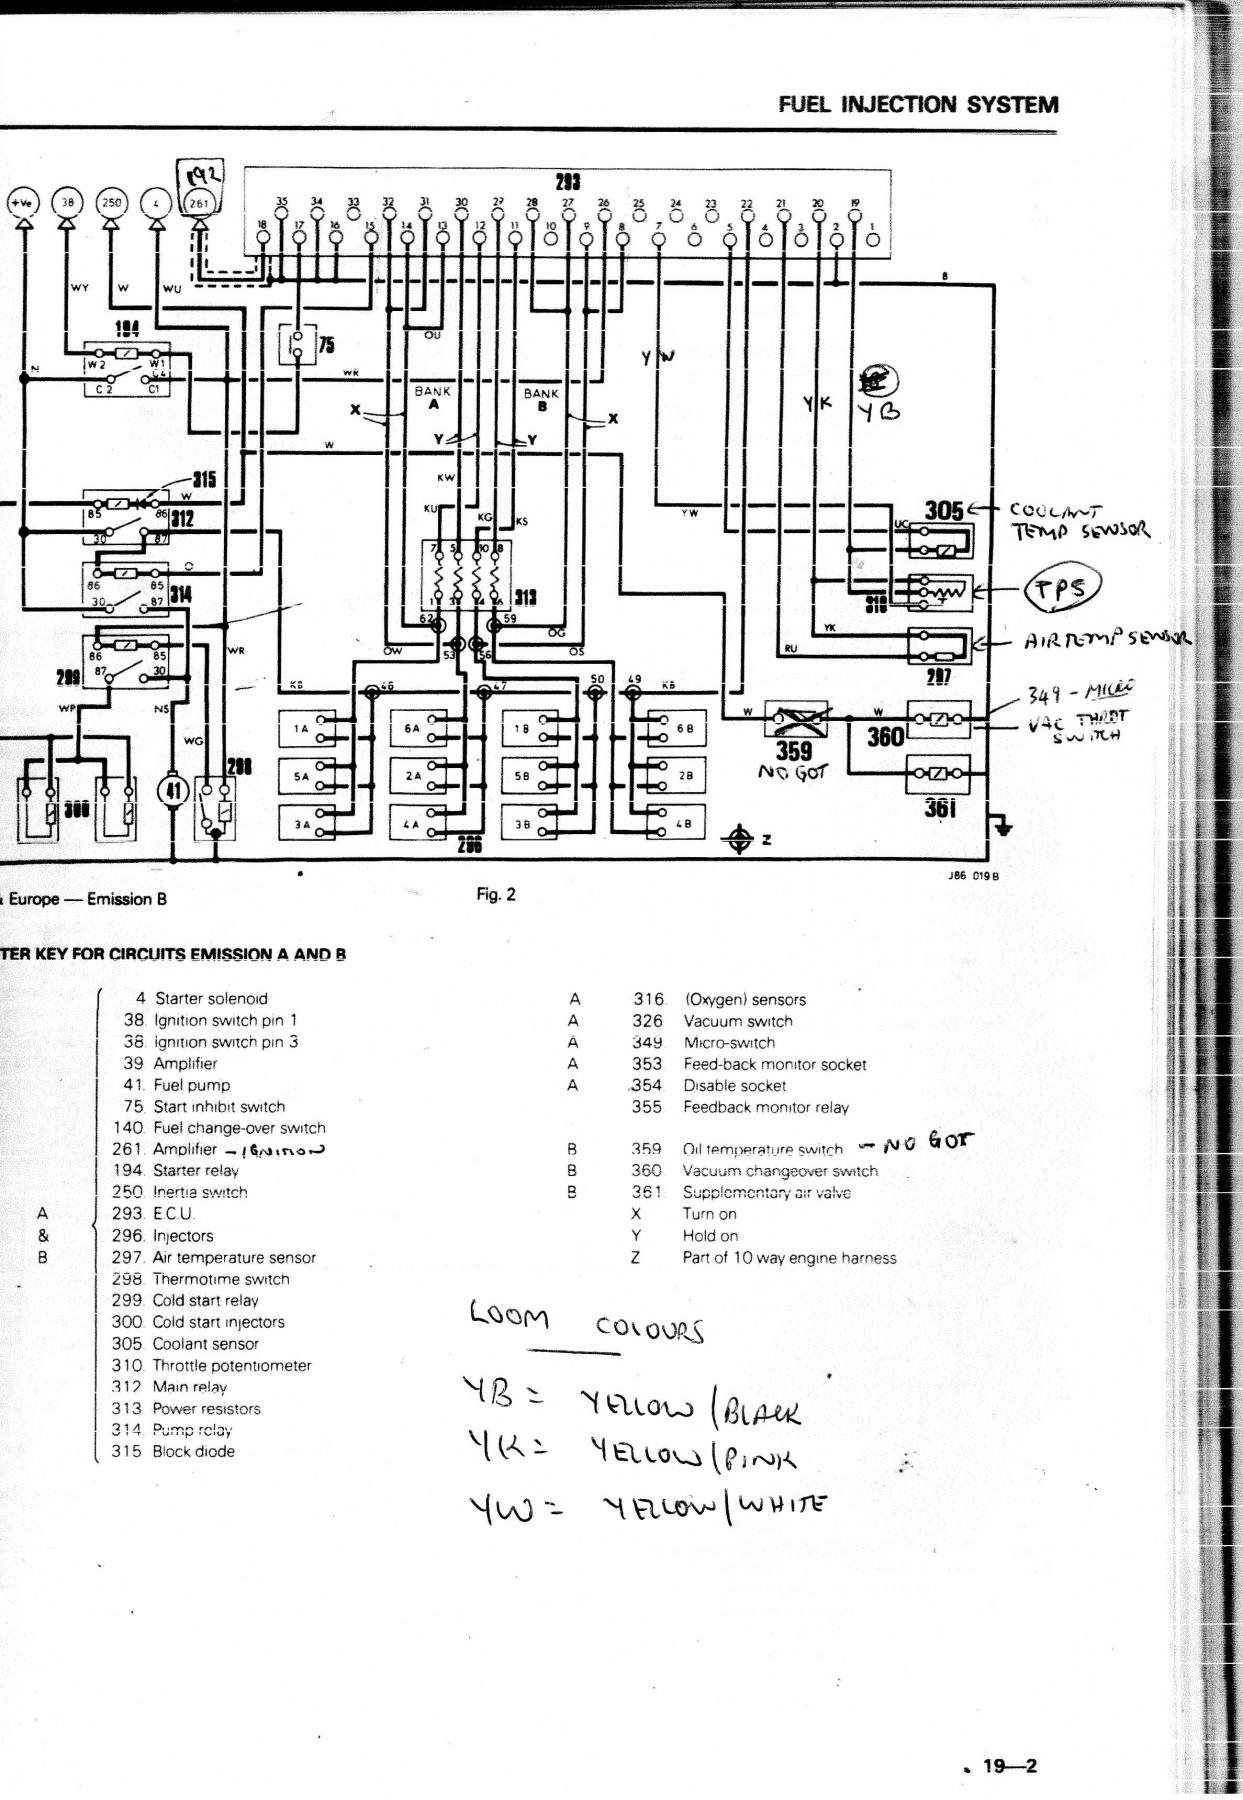 jaguar xj6 wiring diagram trusted schematics wiring diagrams u2022 rh bestbooksrichtreasures com jaguar xj6 electrical diagram jaguar xj6 electrical diagram